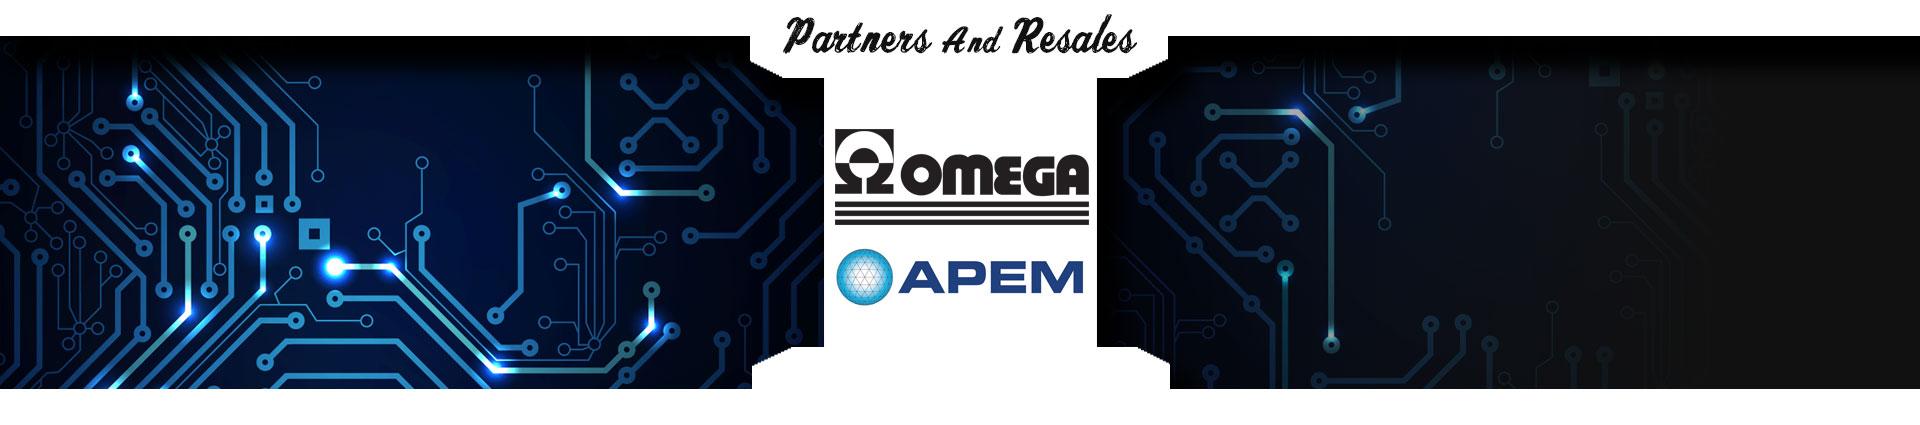 omega_Apem